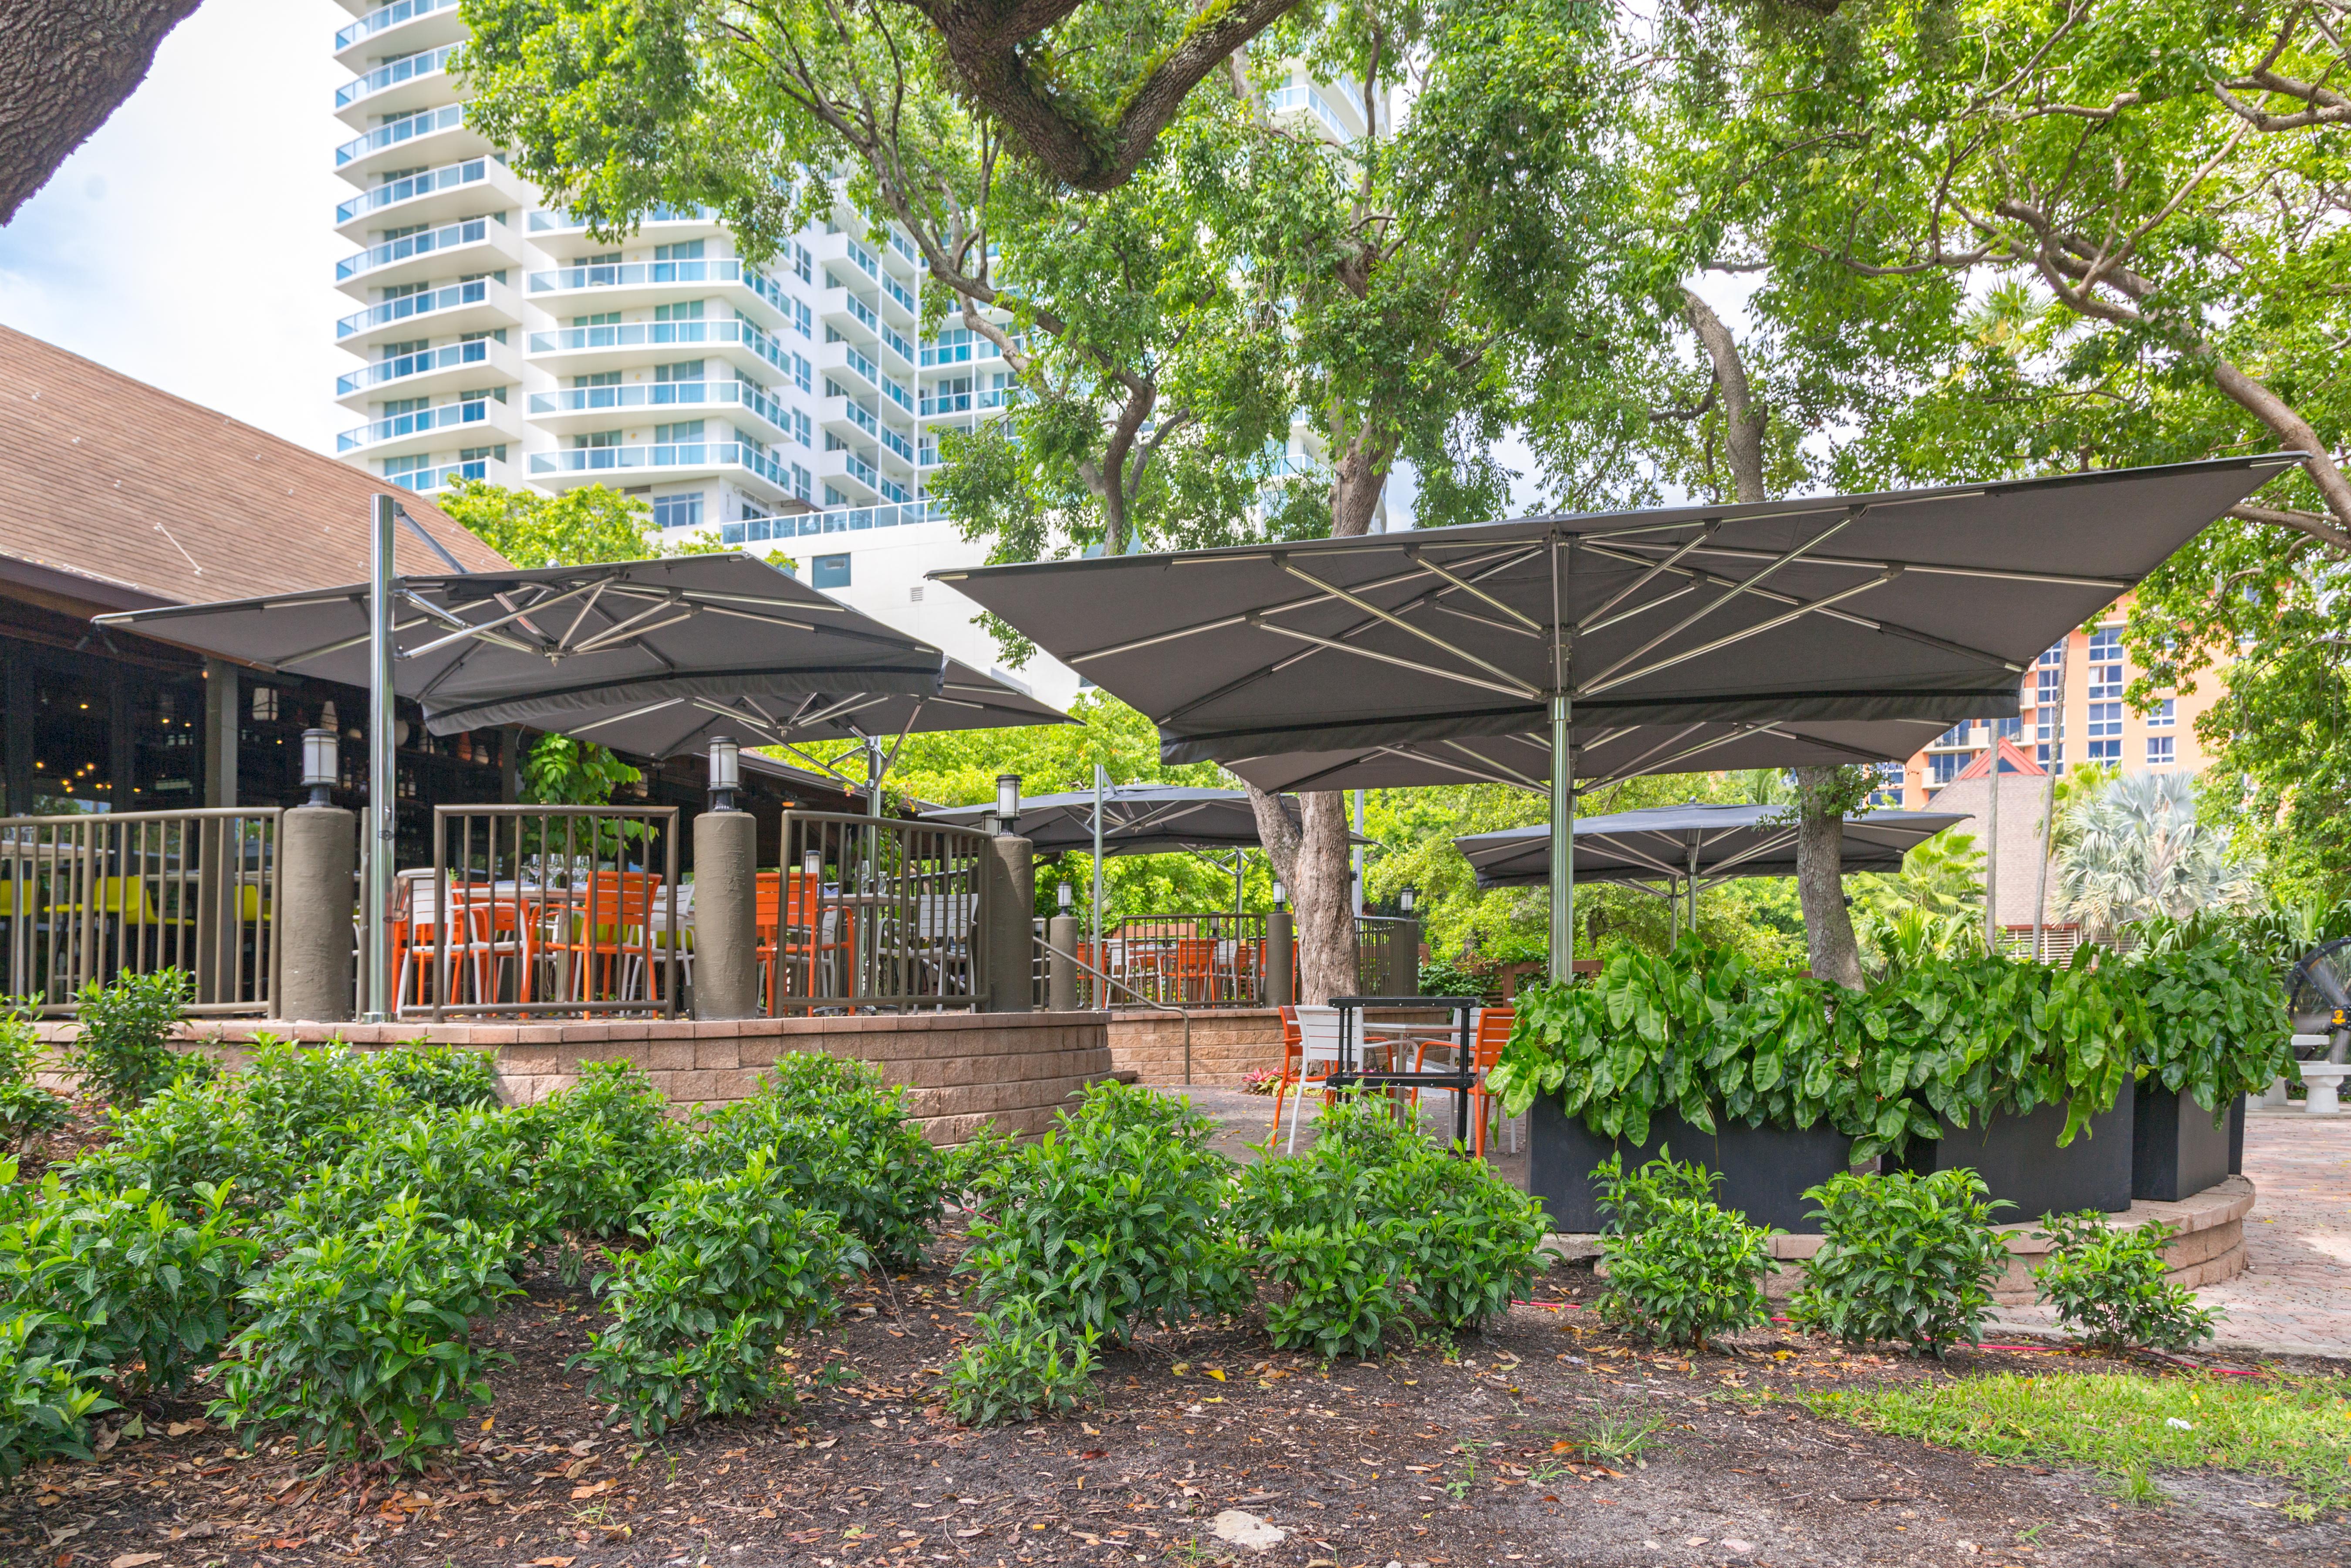 5 Modern Patio Design Ideas For Your Restaurant Tuuci